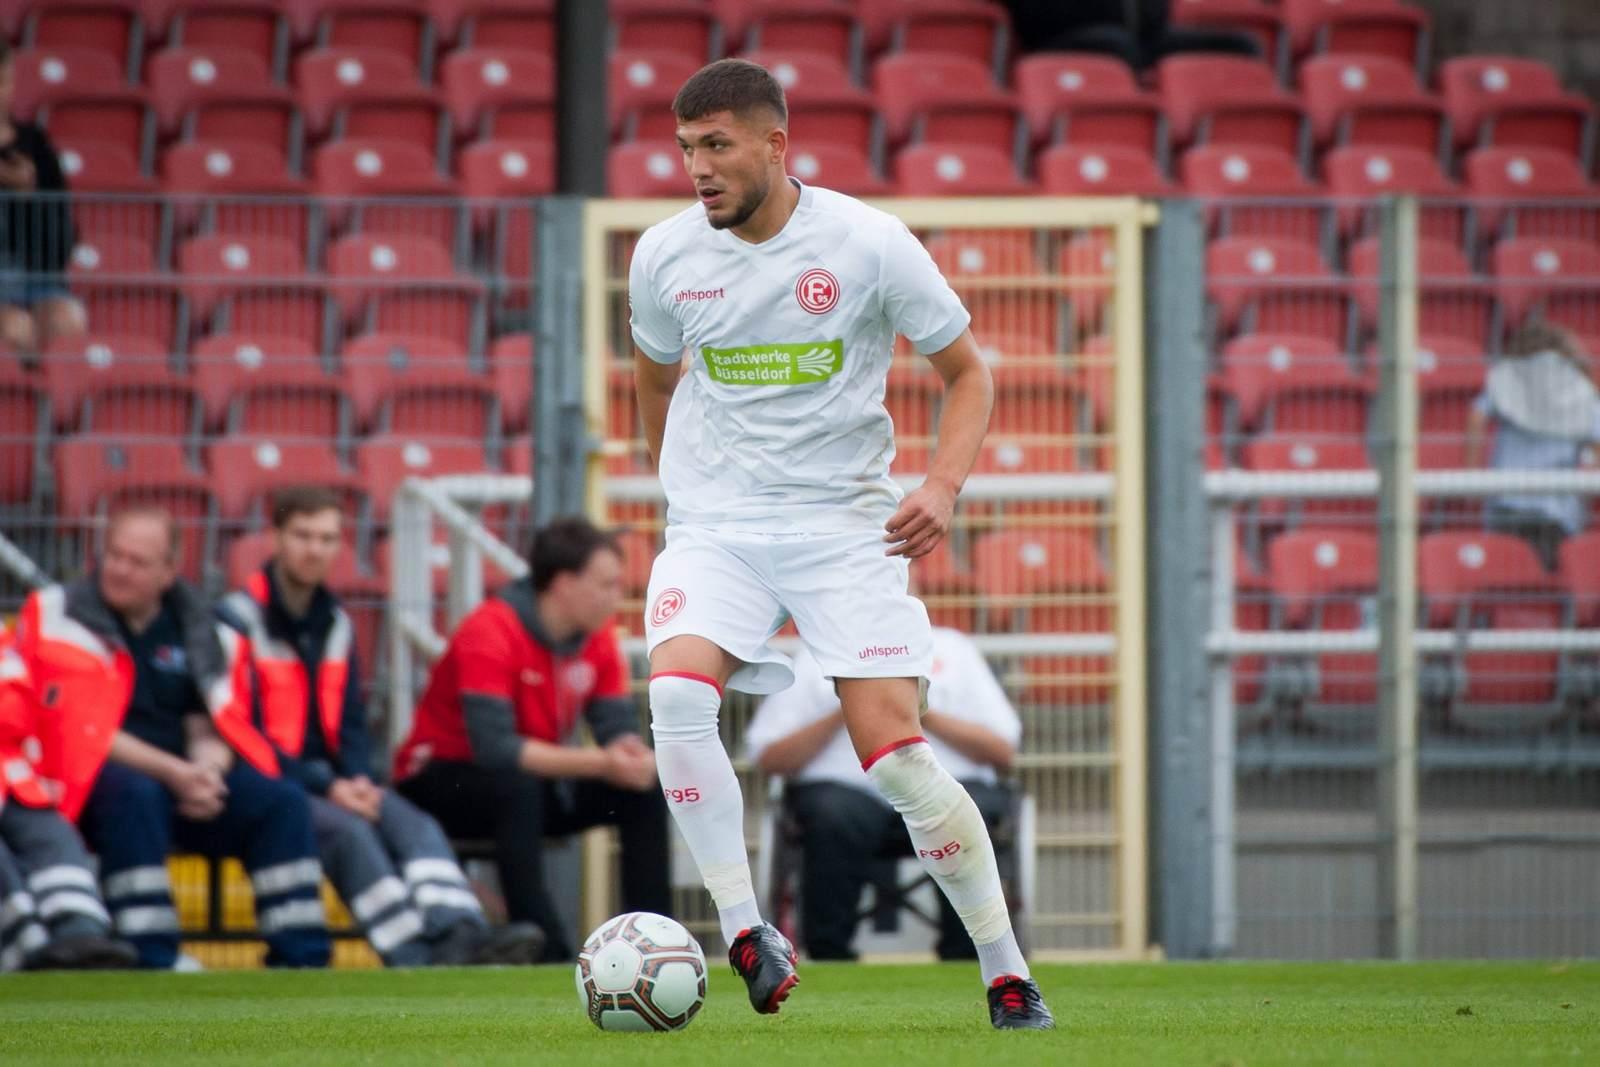 Gökhan Gül am Ball für Fortuna Düsseldorf